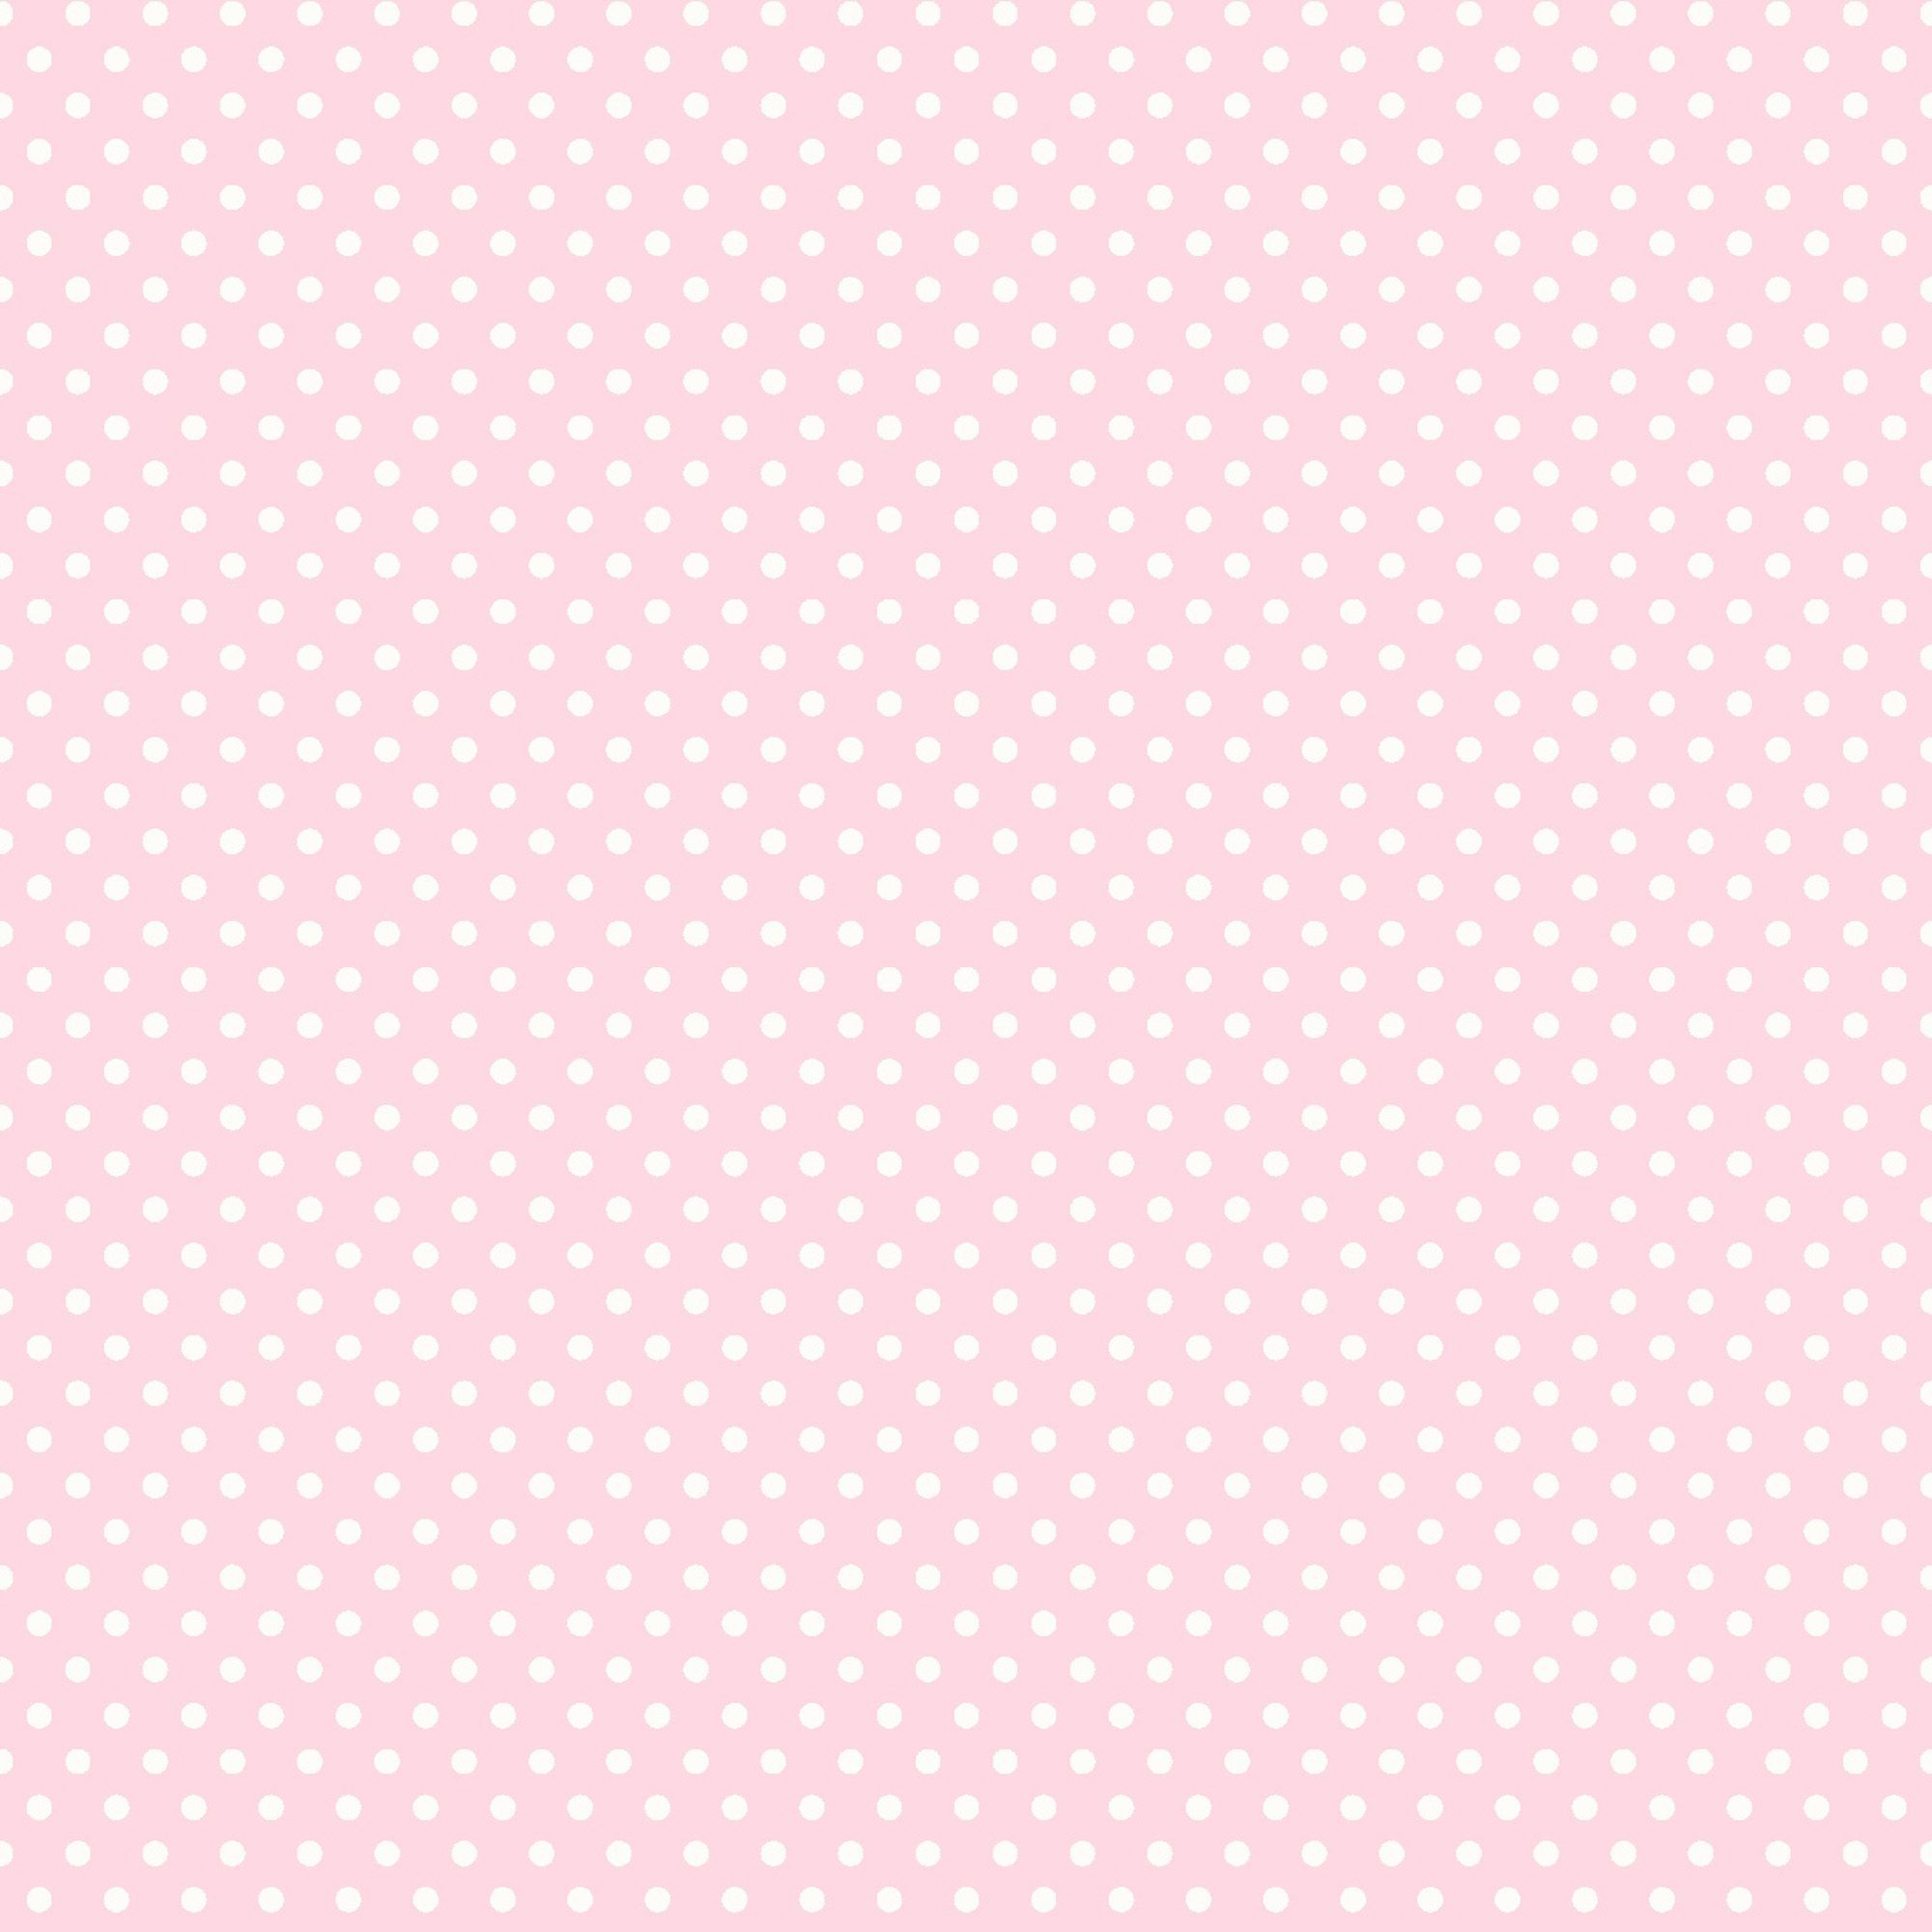 Pics photos pink polka dot s wallpaper - Holden D Cor Pink White Polka Dots Wallpaper Departments Diy